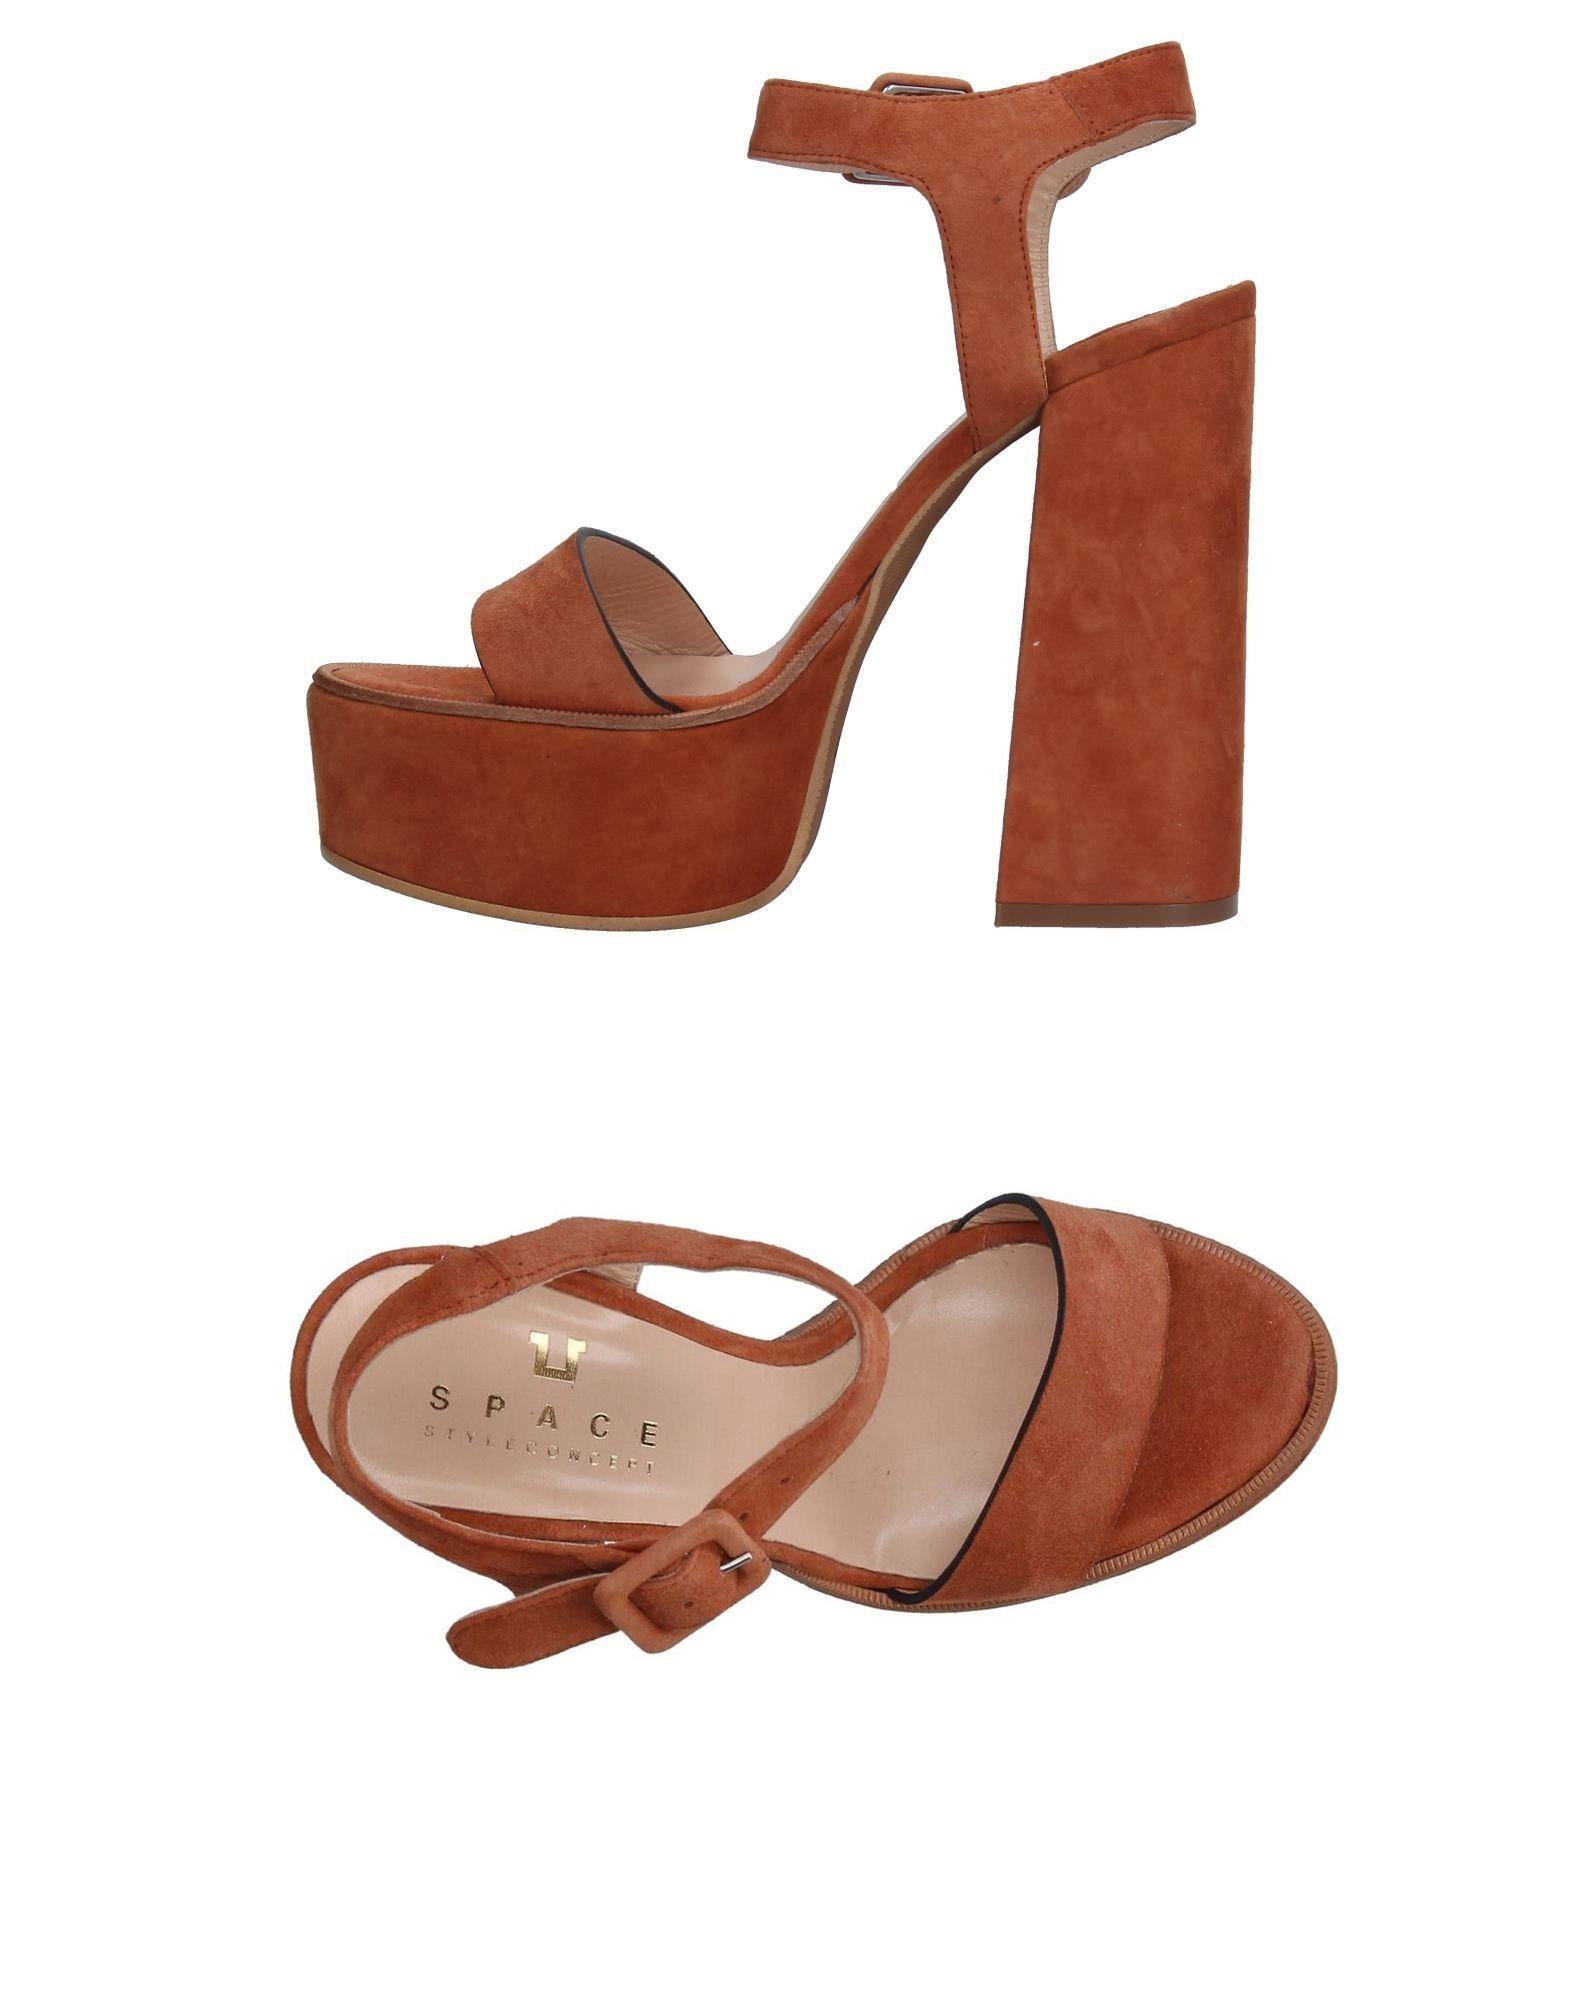 Space Style Concept Sandalen Damen  11266806SO Gute Qualität beliebte Schuhe